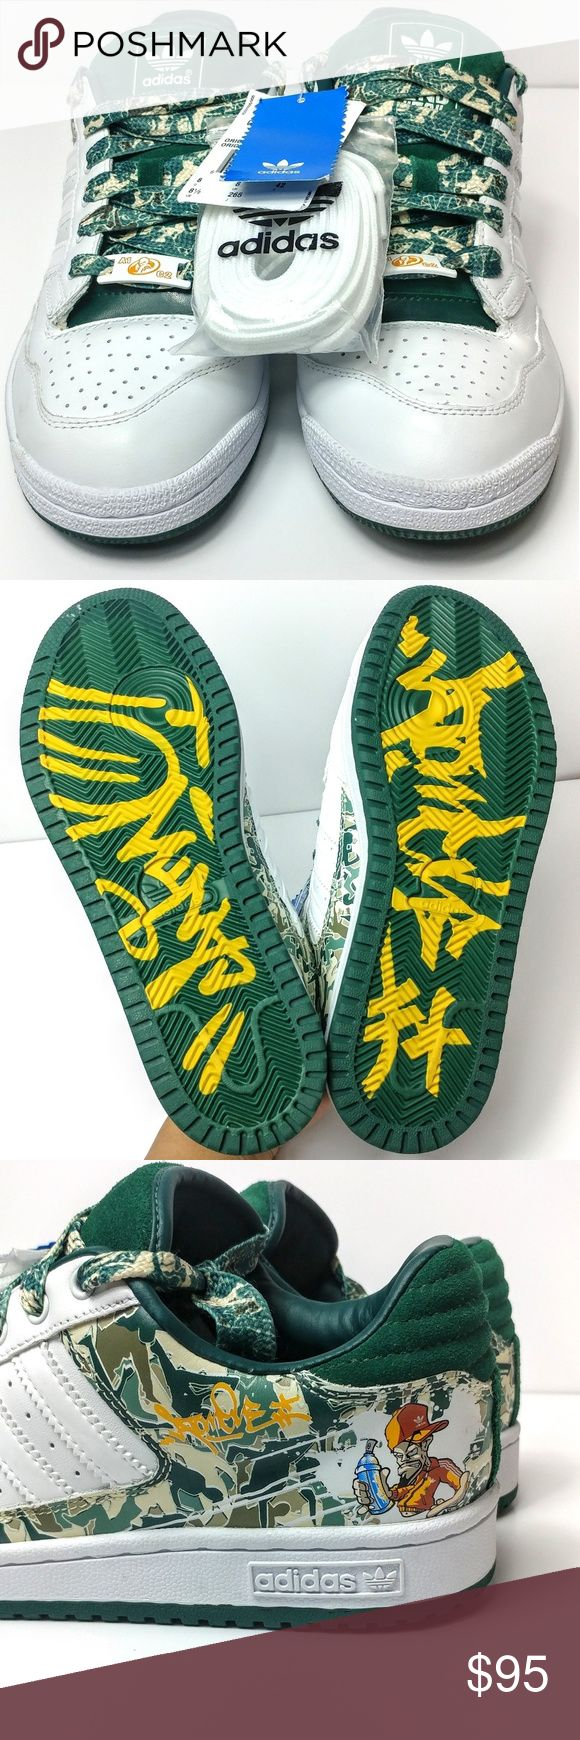 Adidas Original Centennial Lo A1 C2 Size 8.5